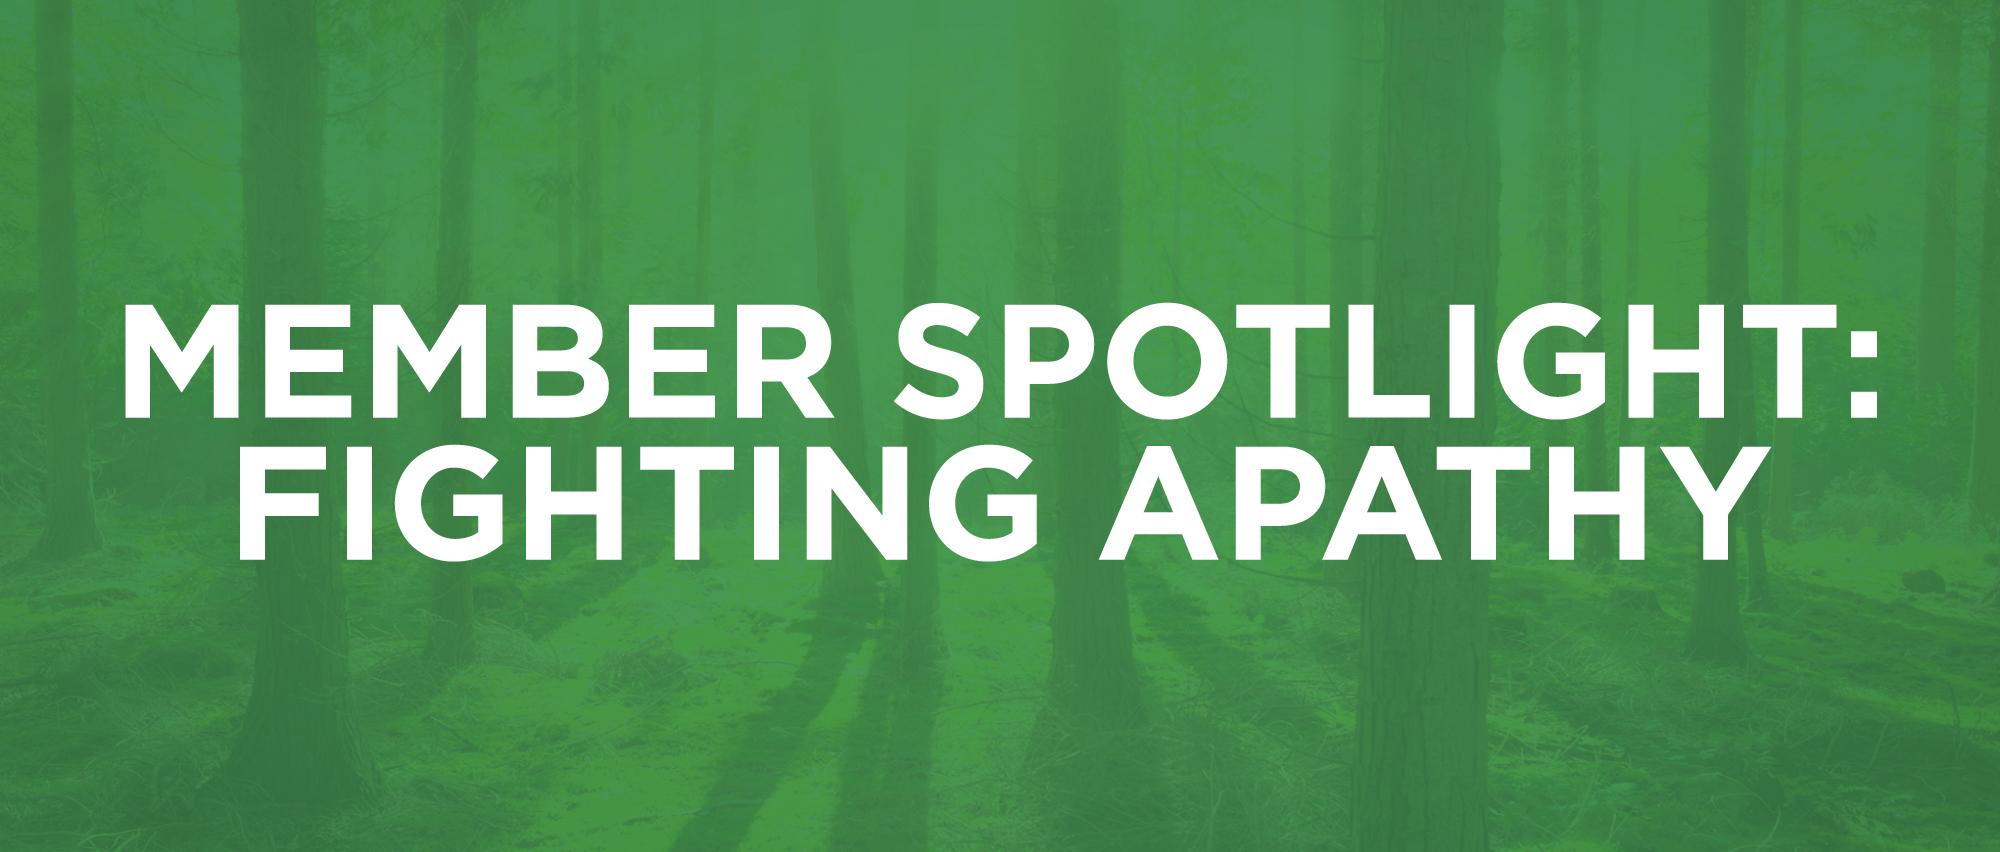 MemberSpotlight-1-Apathy.jpg